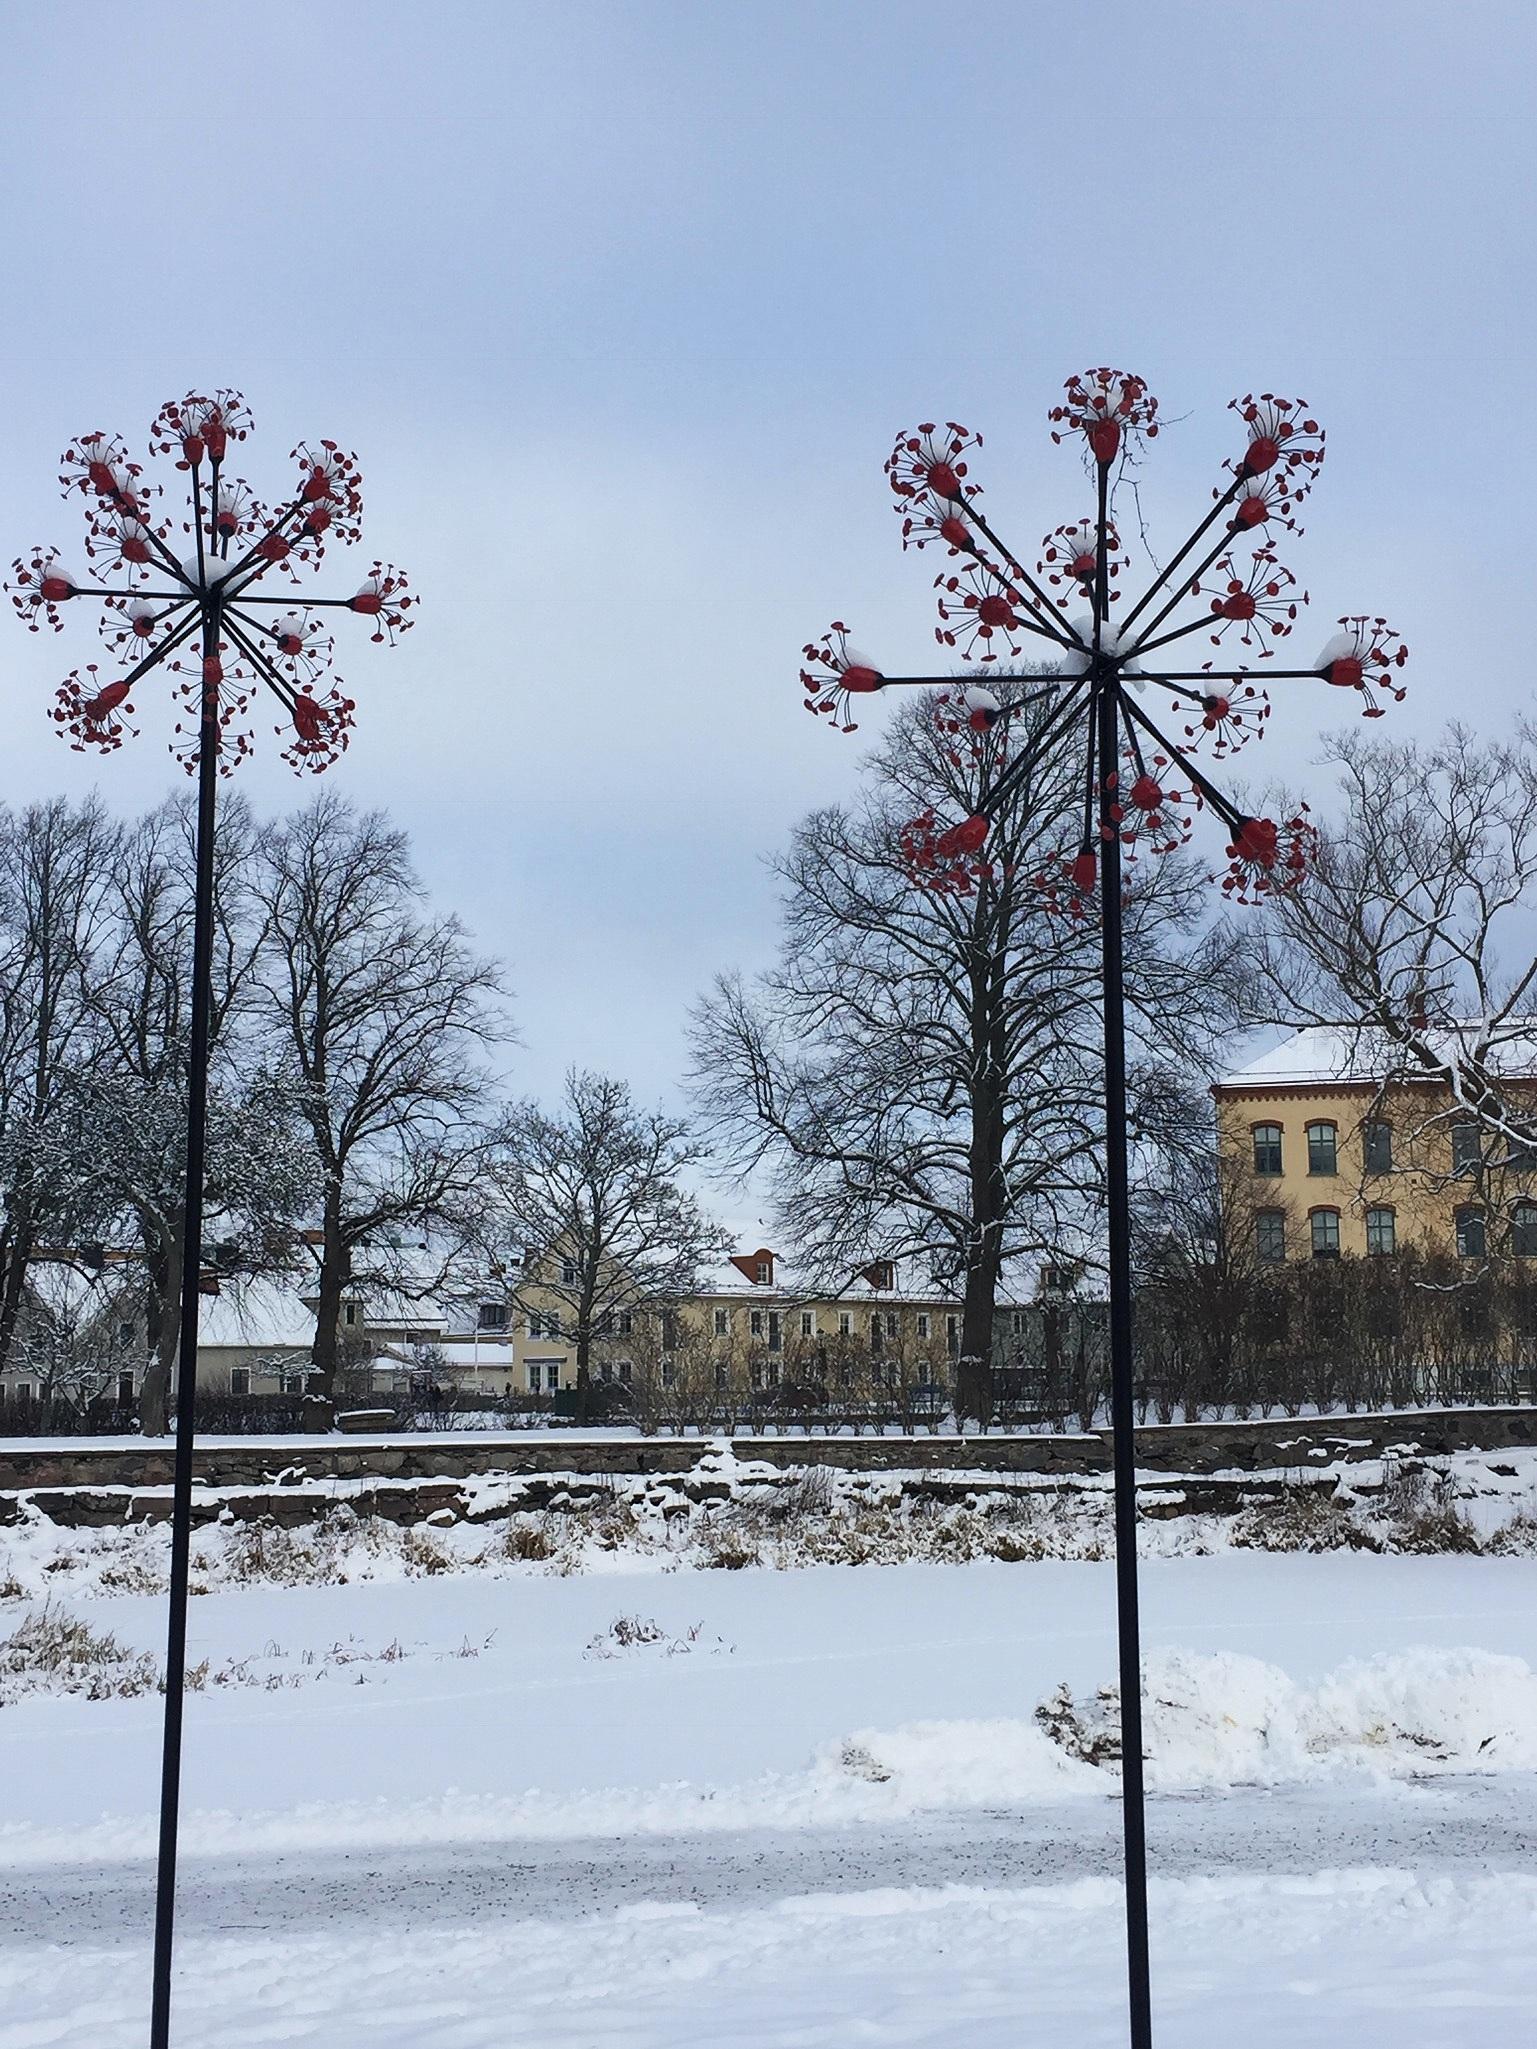 umbel series     jenni ward  mariestad, sweden  photo credit: cecily ferguson, 2019